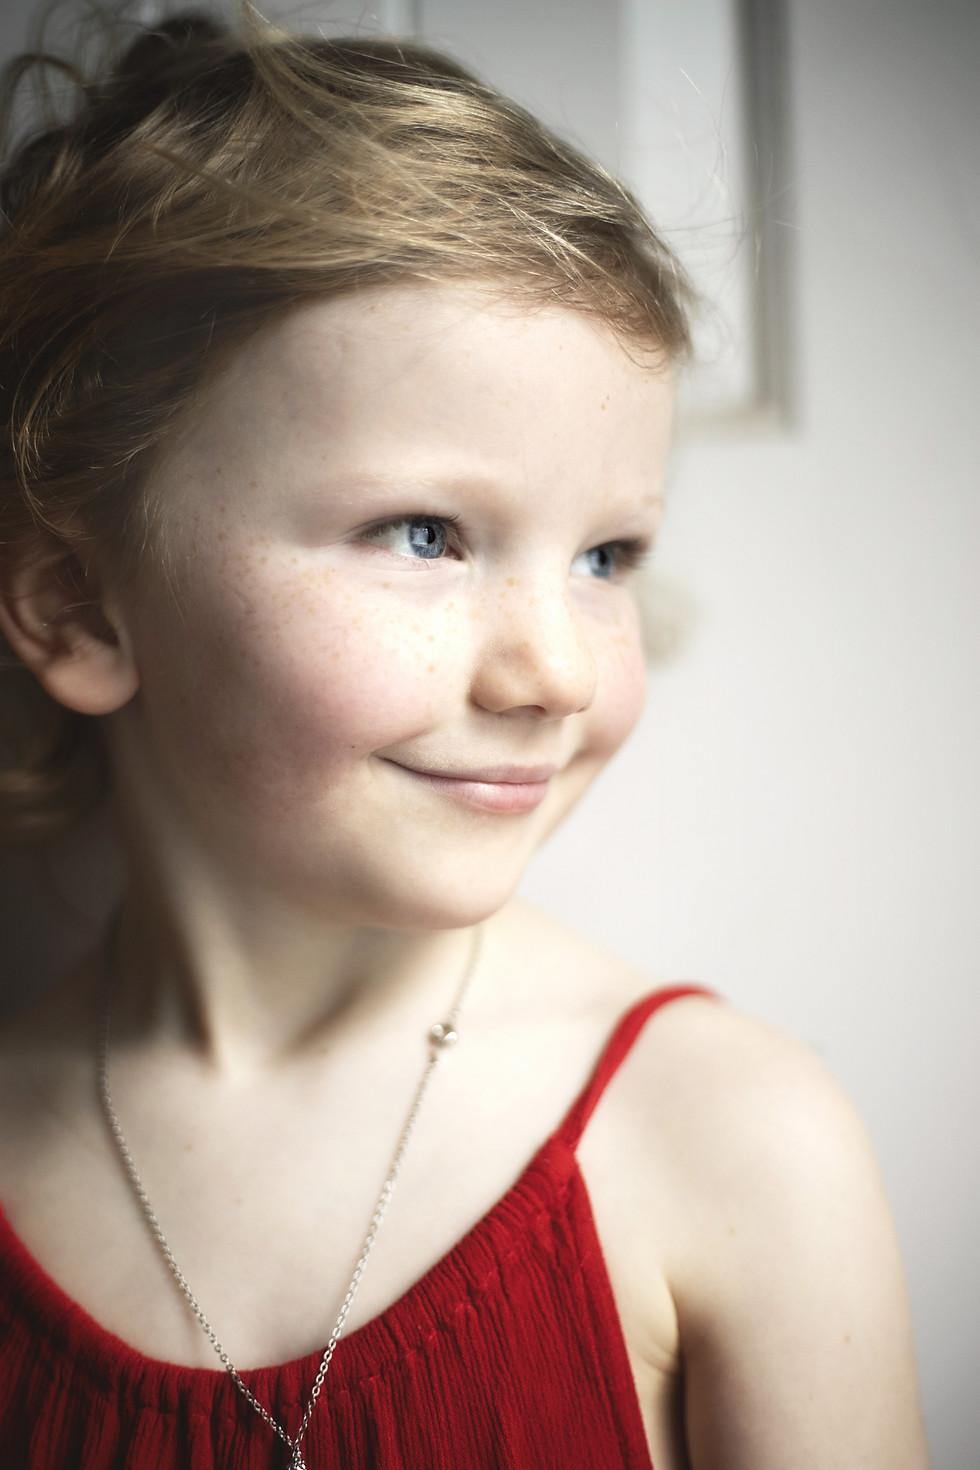 Portraits and Family Photoshoots